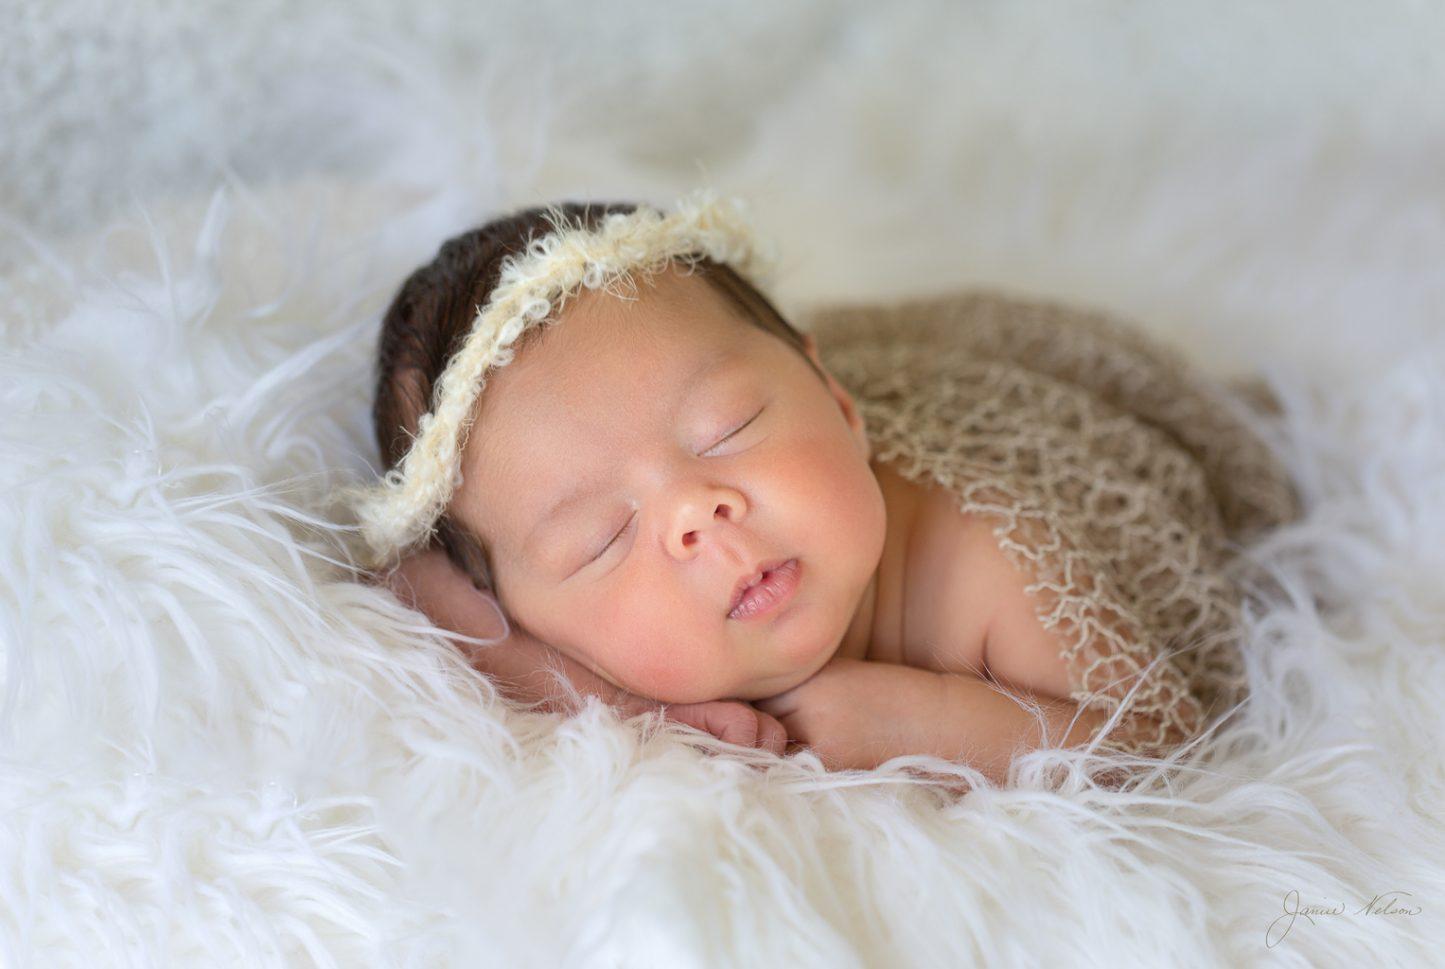 Newborn Photography - Sleeping Baby